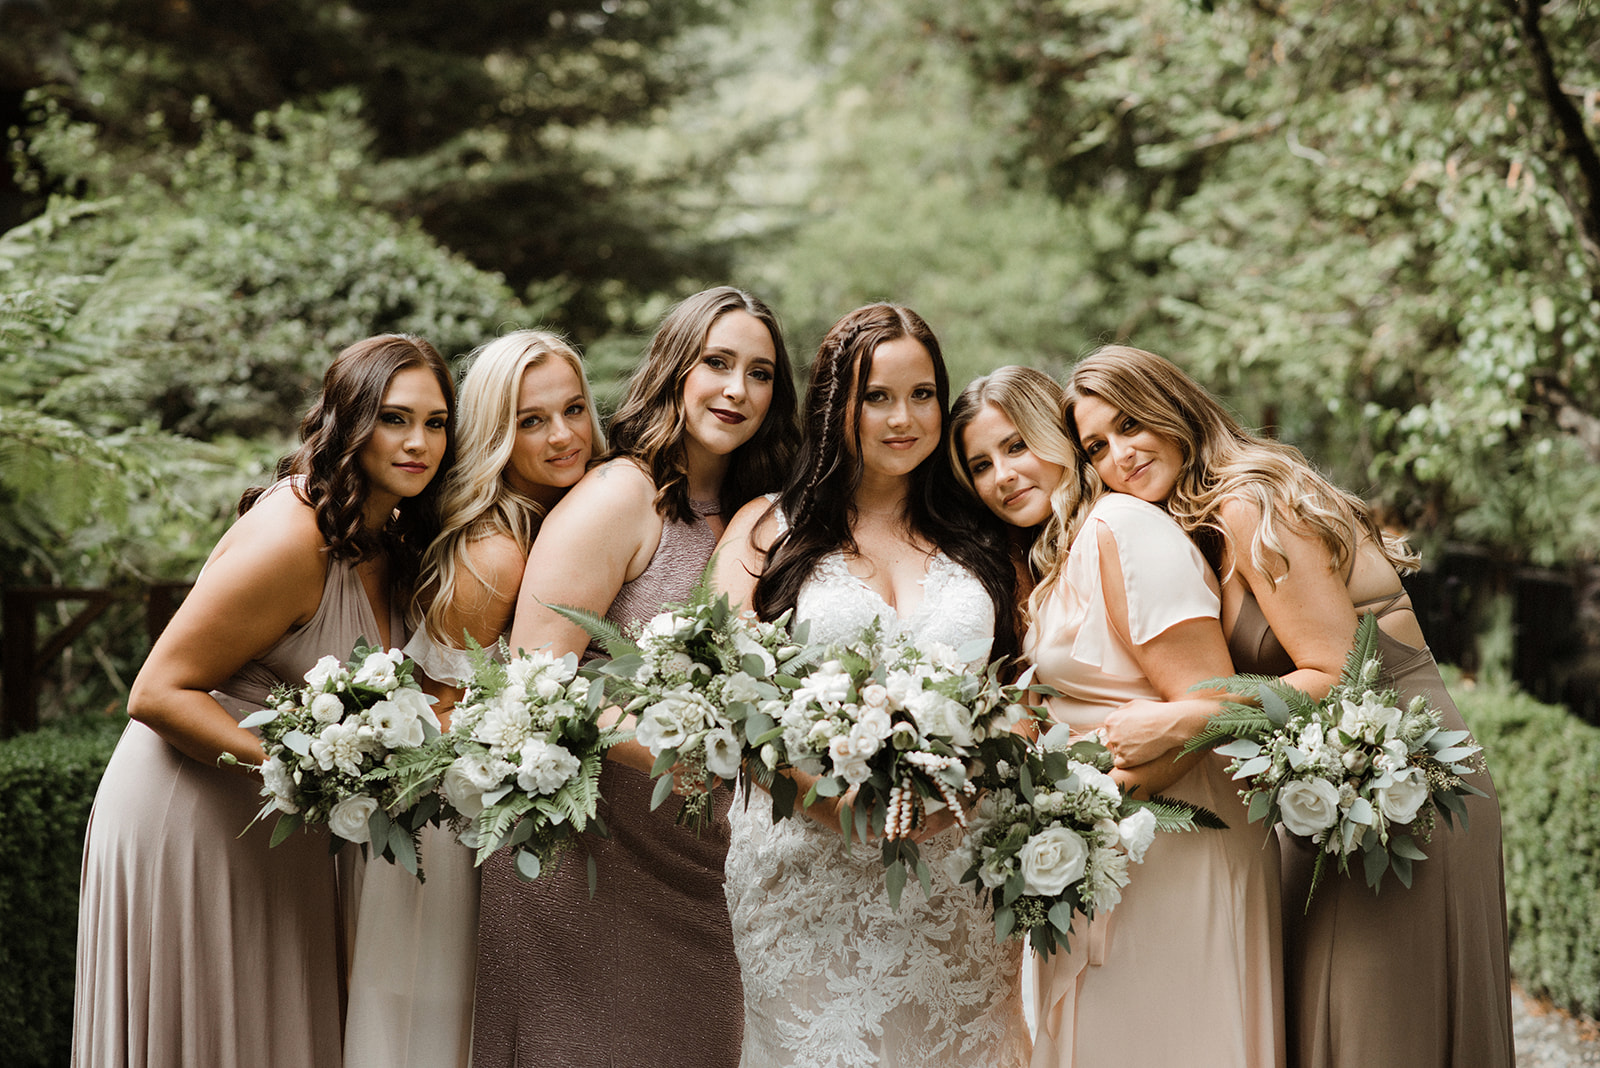 berger-wedding-157.jpg